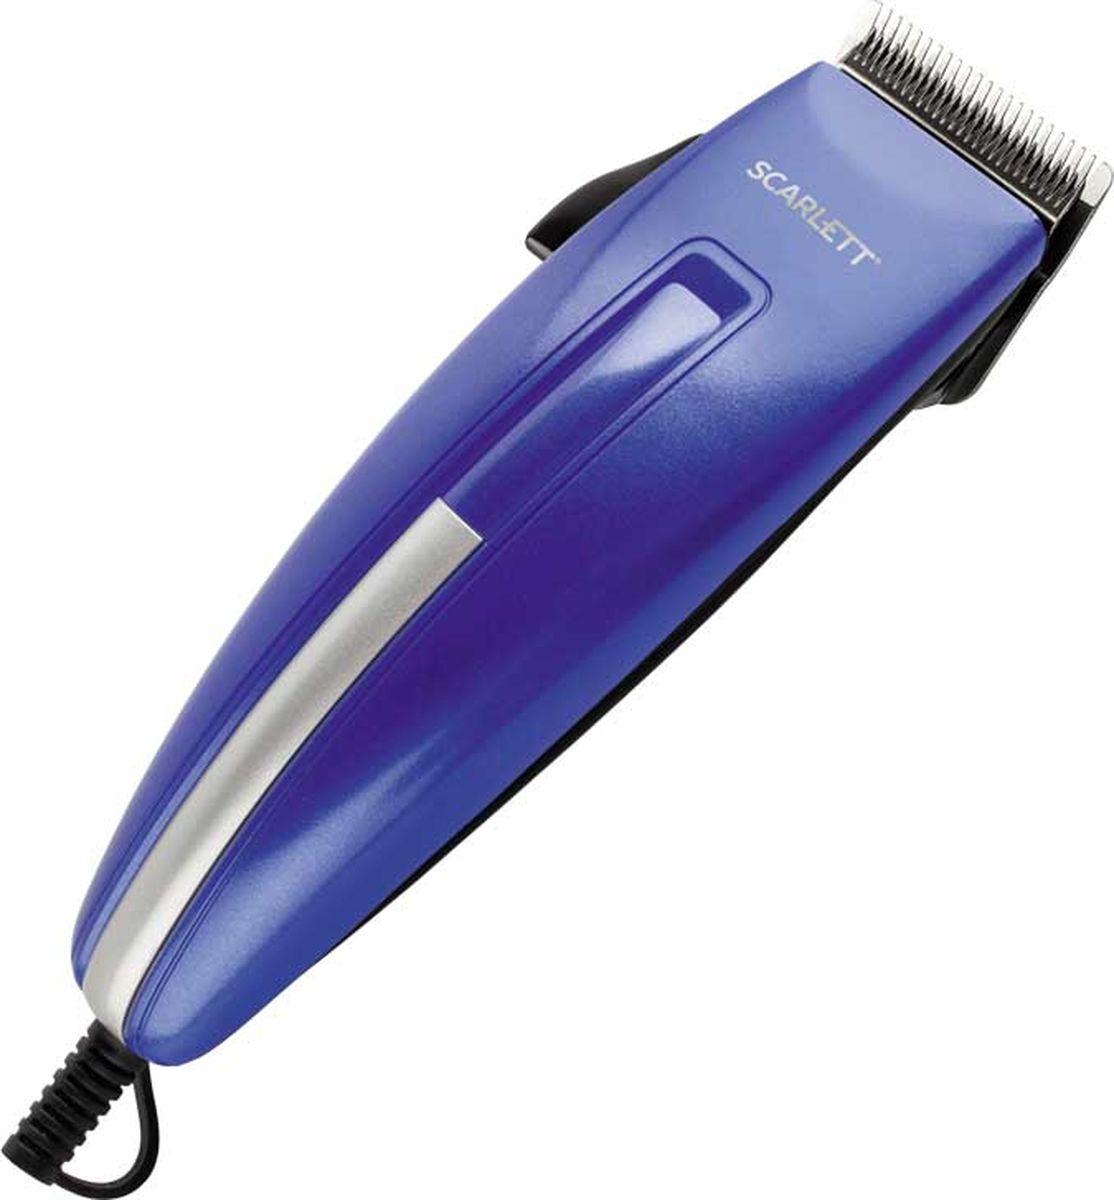 Scarlett SC-HC63C10, Blue машинка для стрижки волос машинка для стрижки волос scarlett sc hc63c07